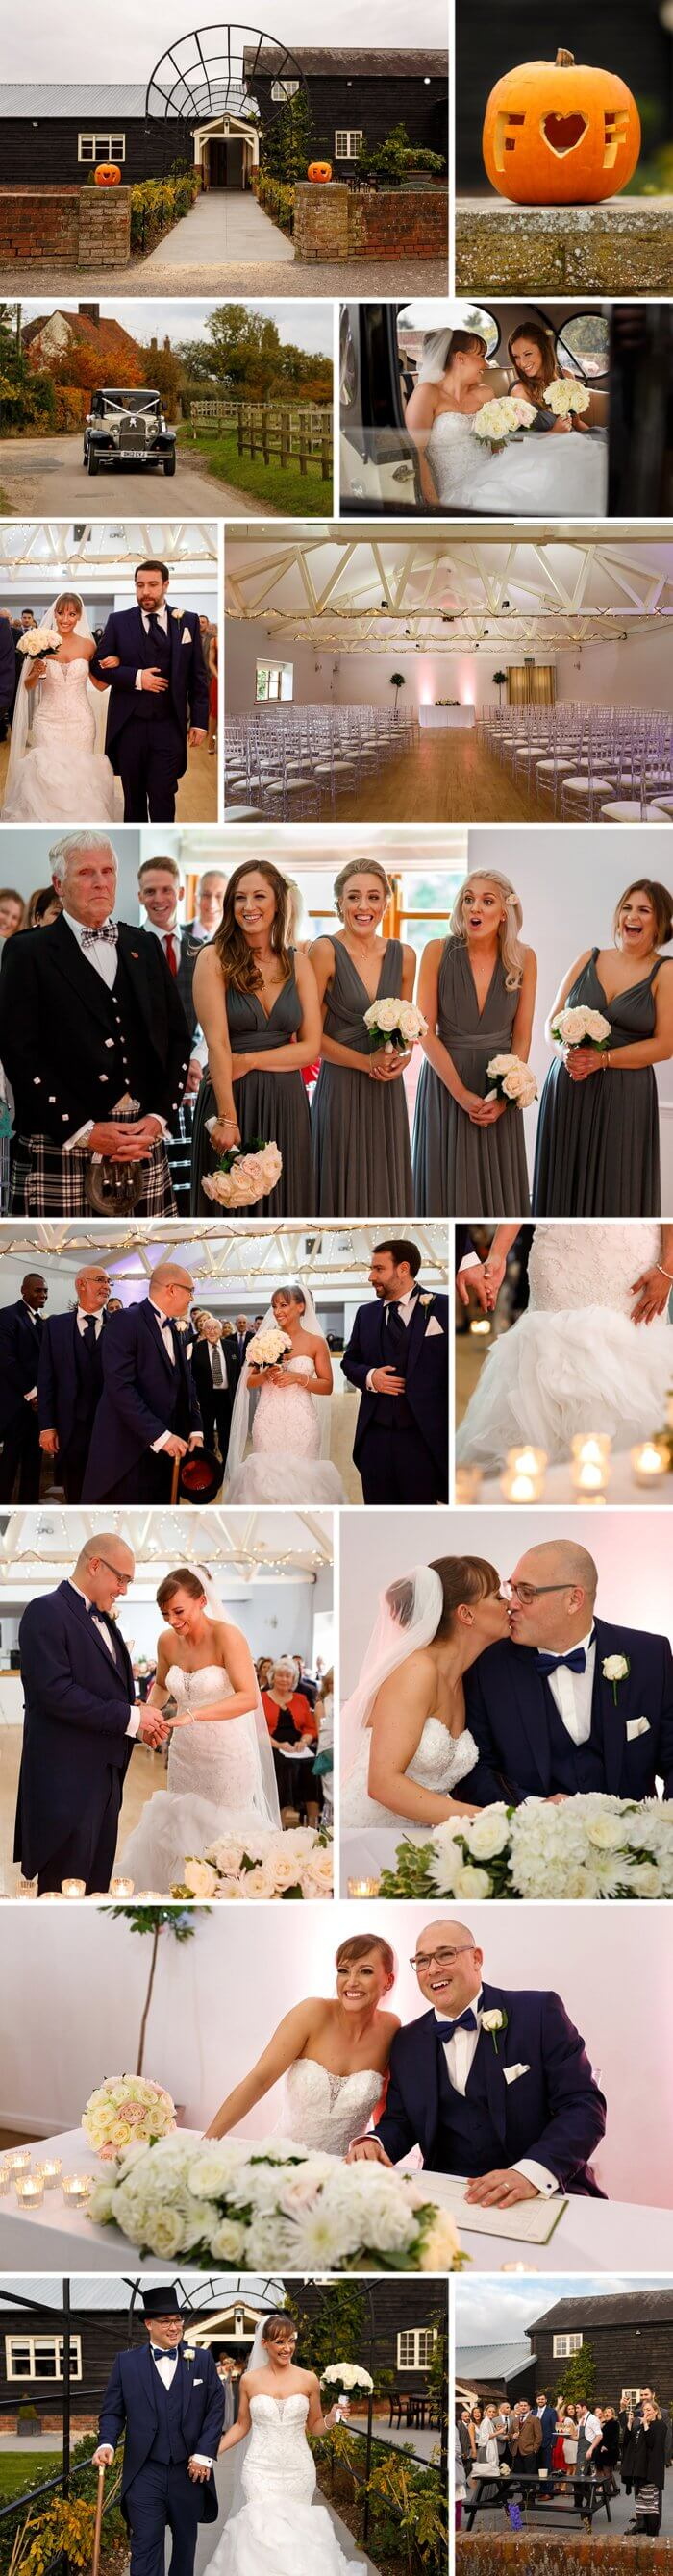 Hochzeitsdeko Grau